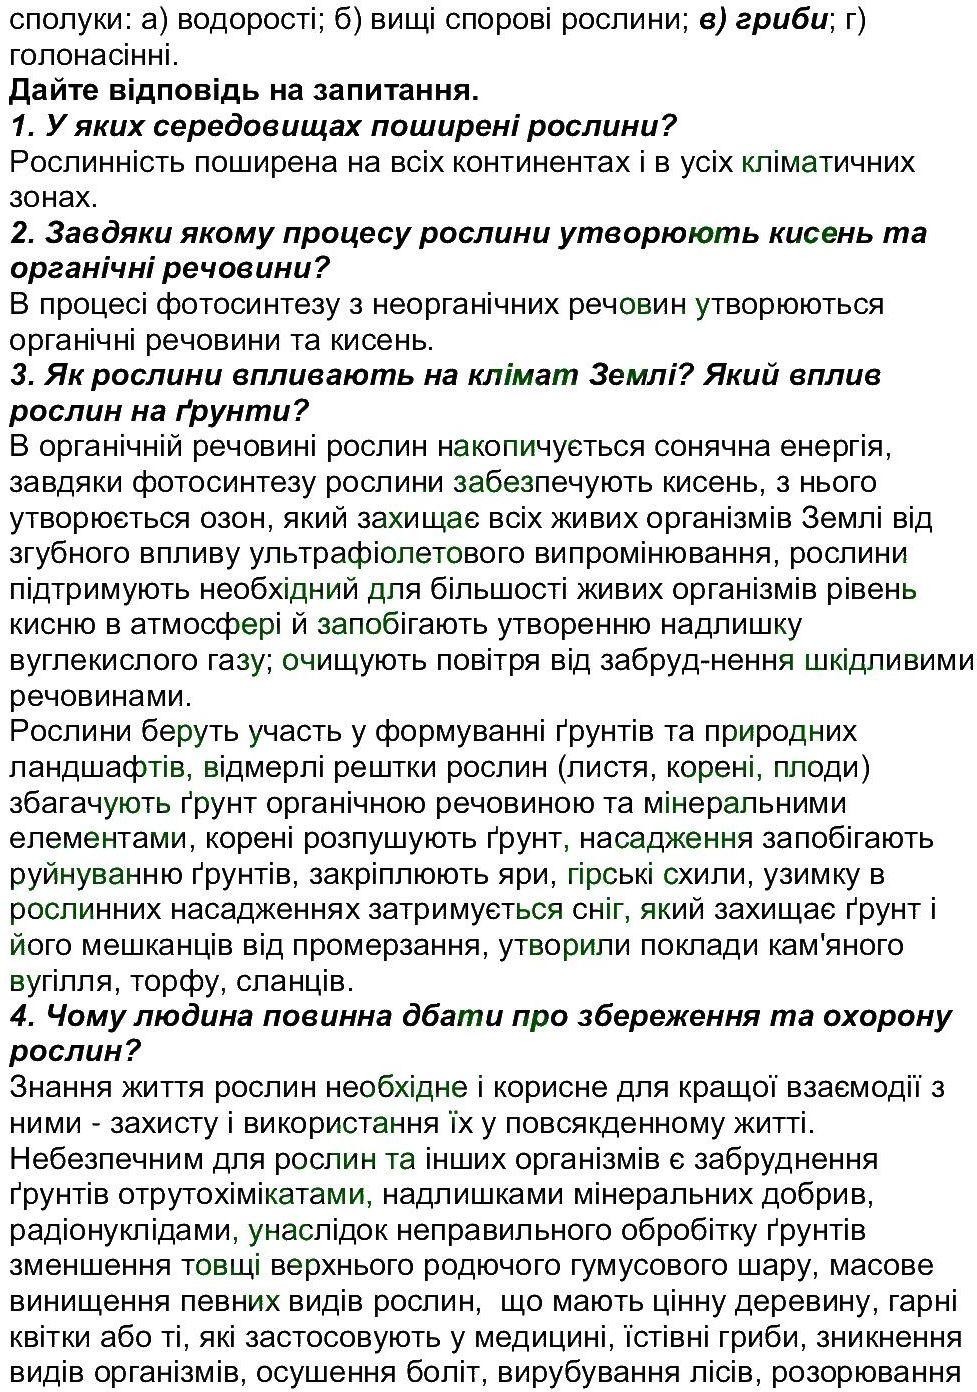 6-biologiya-li-ostapchenko-pg-balan-nyu-matyash-2016--tema-4-riznomanitnist-roslin-ст186-191-rnd6765.jpg